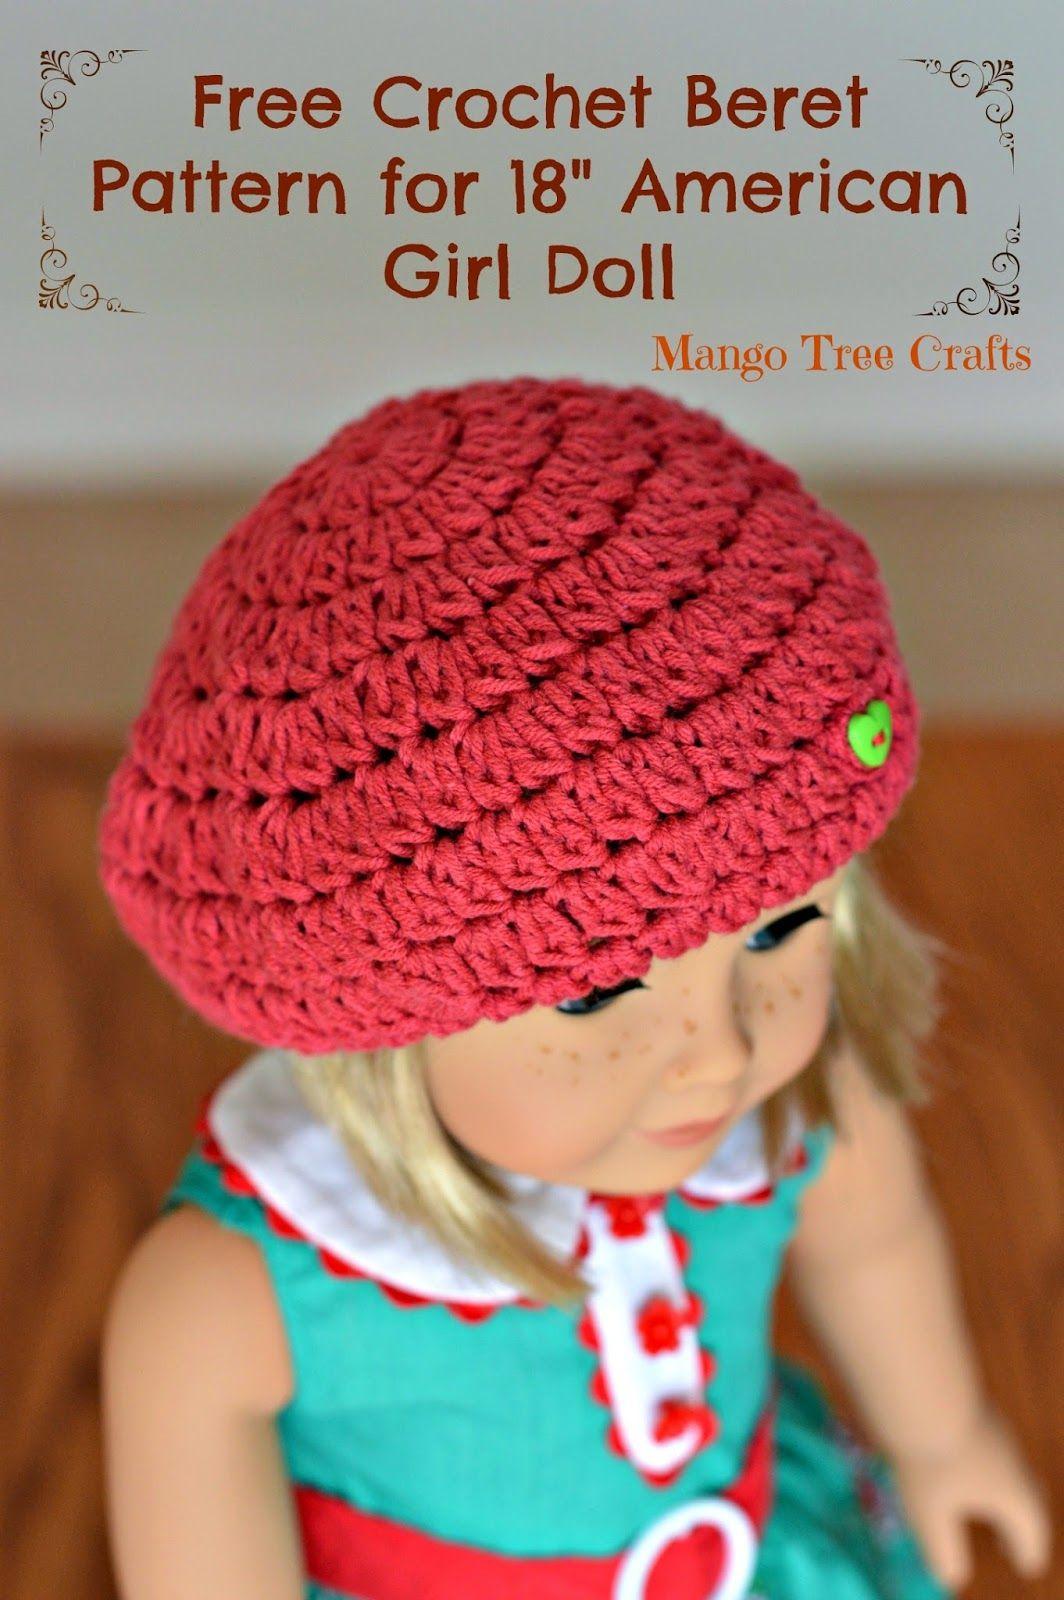 Crochet beret hat pattern for 18 american girl doll mango tree crochet beret hat pattern for 18 american girl doll bankloansurffo Gallery